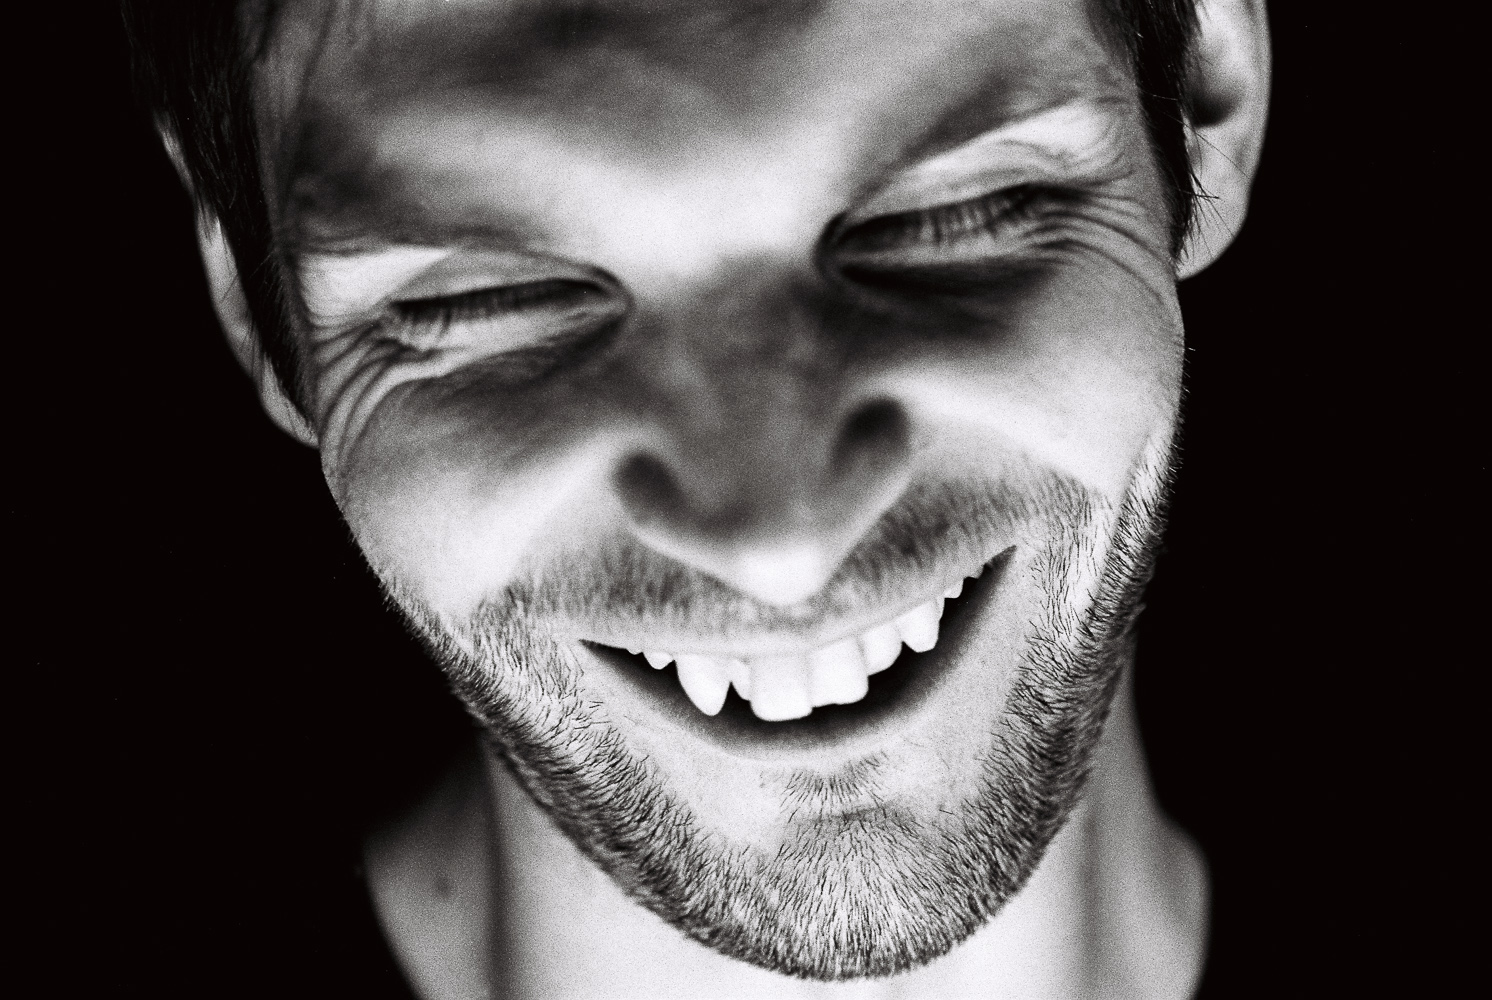 Face-happy-Wellington-photographer-Paul-Fisher.jpg